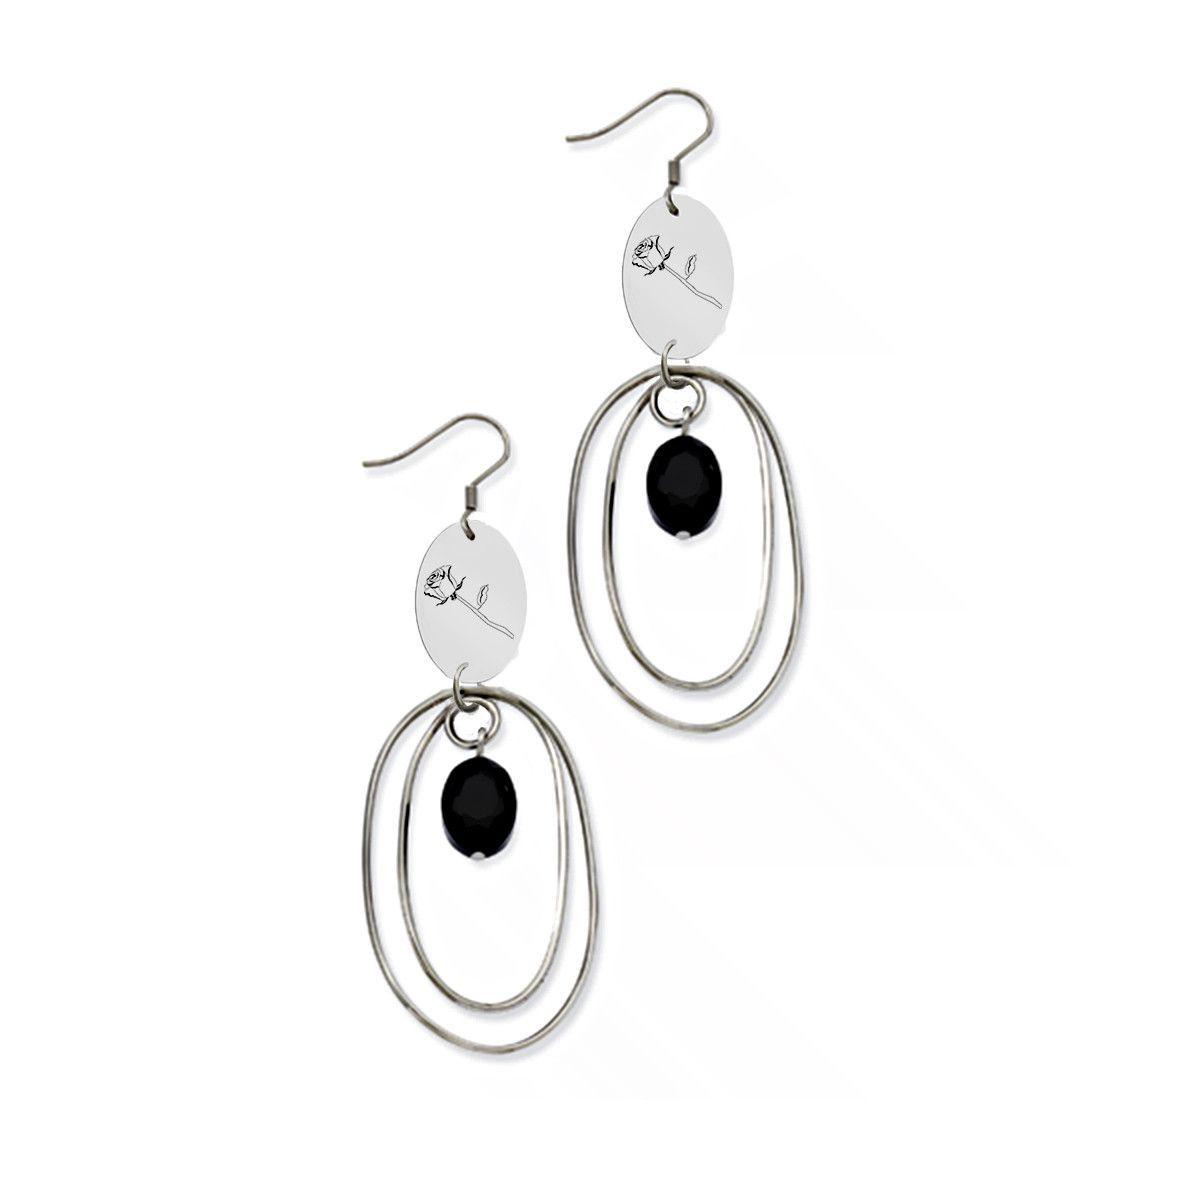 Sigma Alpha Iota Symbol Stainless Steel Loop Earrings Sigma